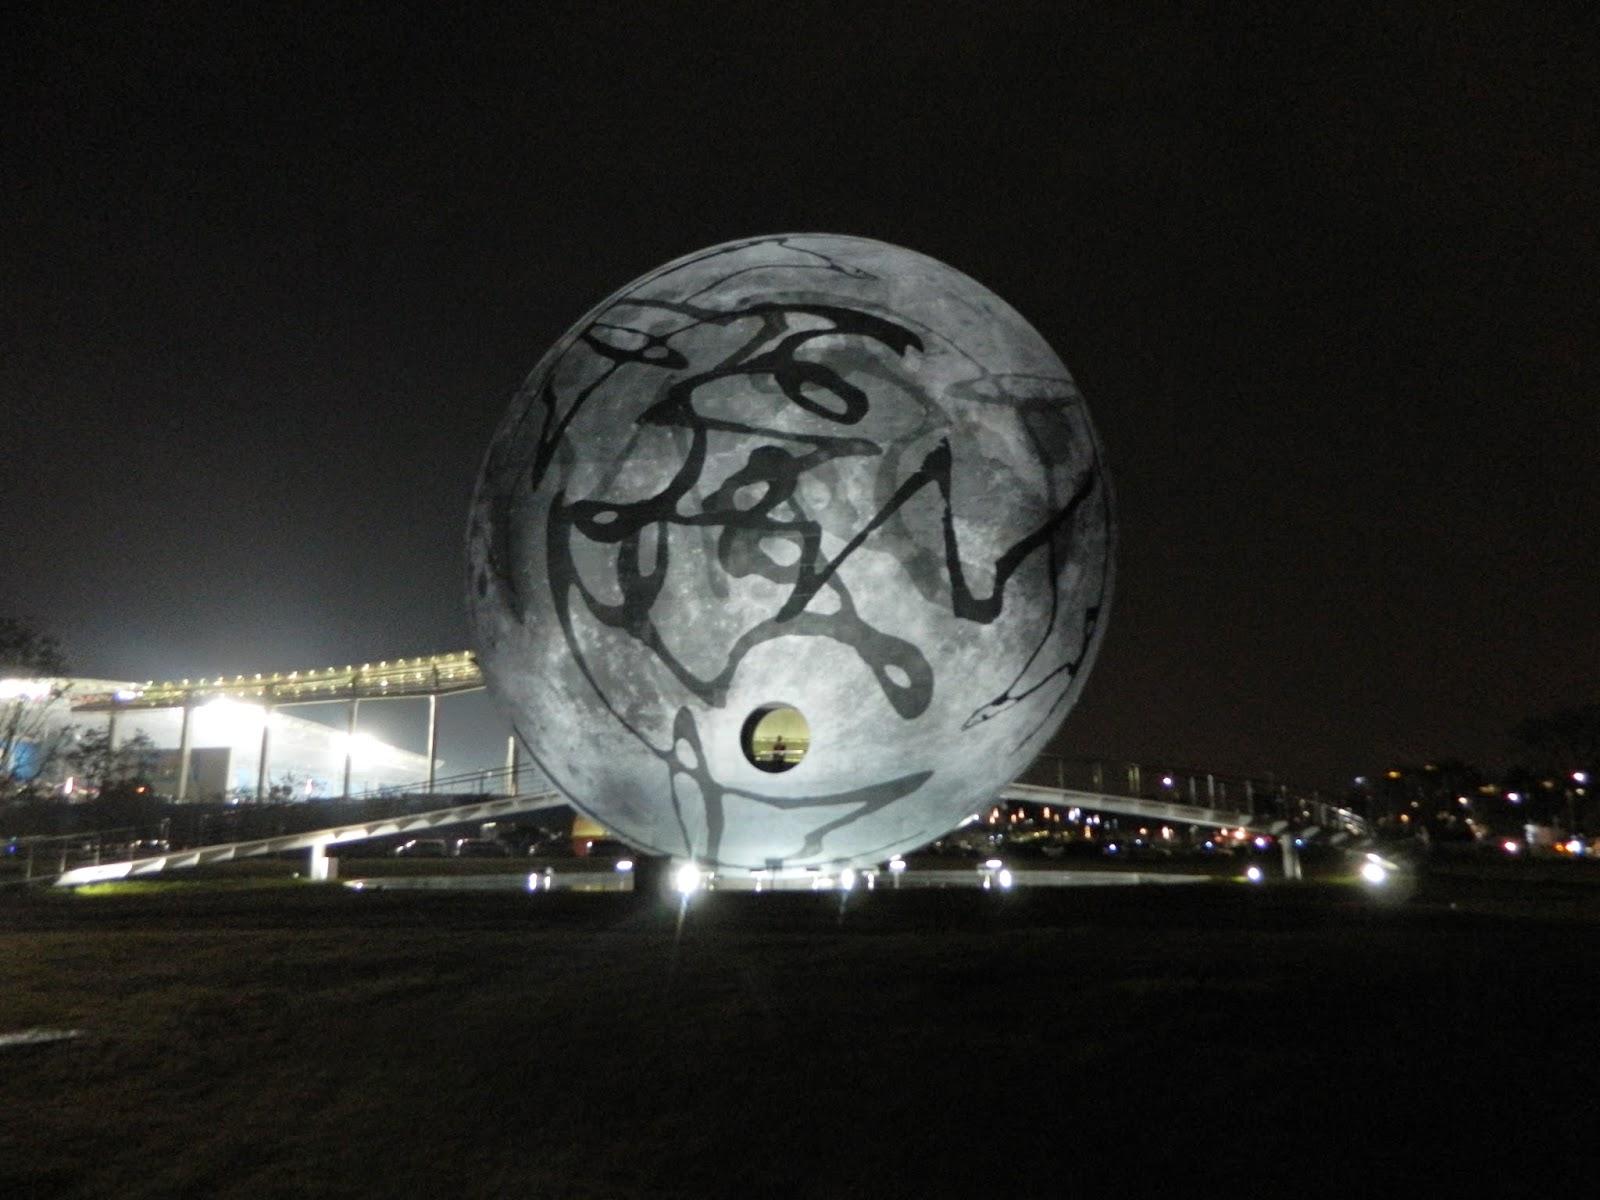 Moon Art at the Asian Games main Stadium